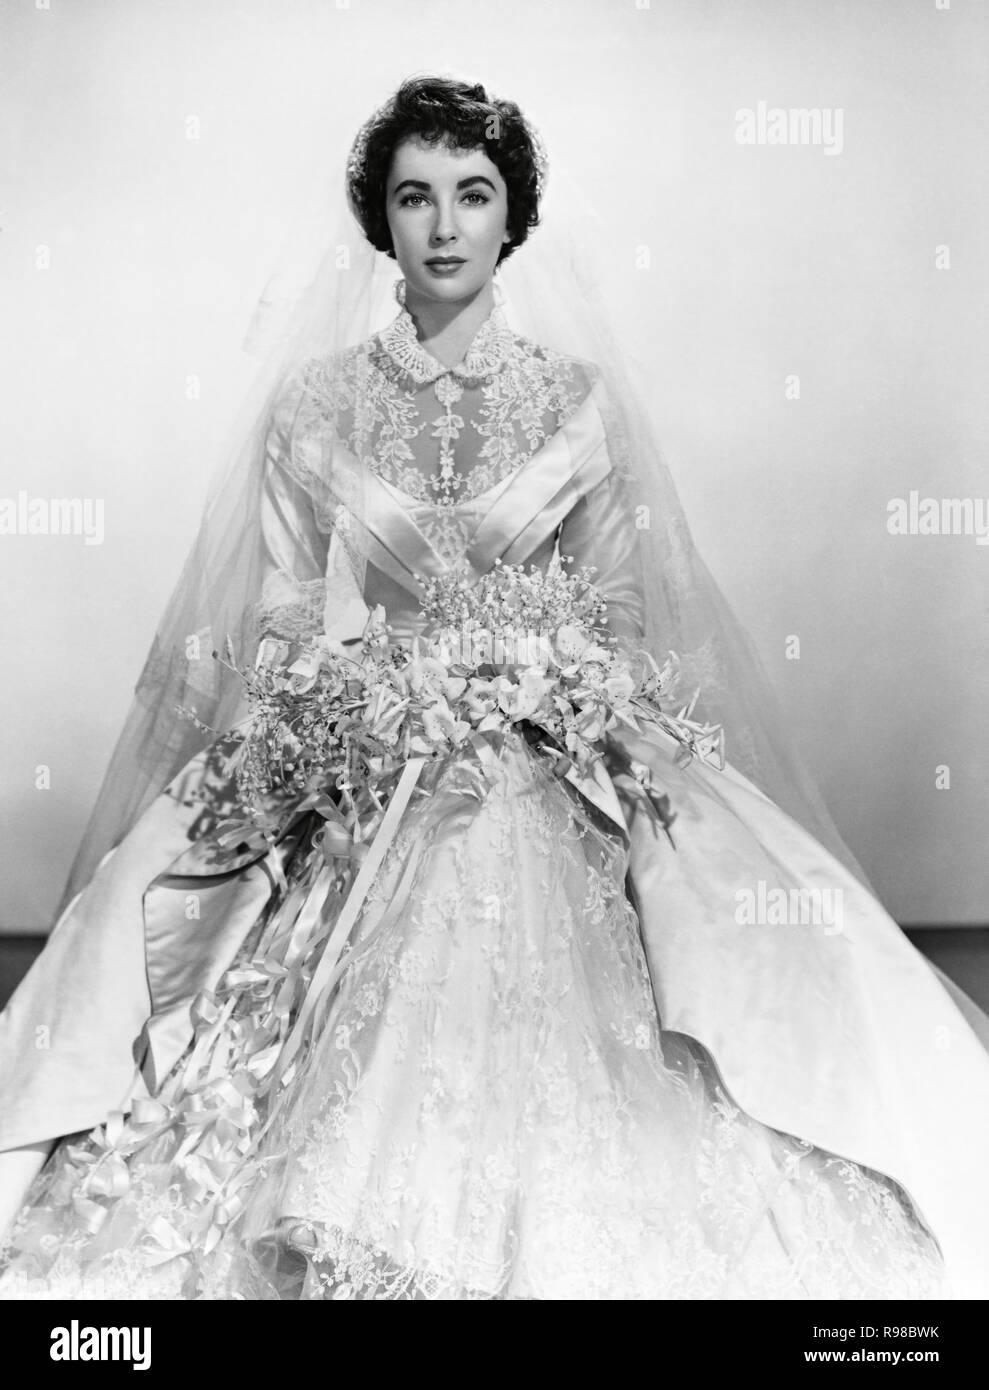 Elizabeth Taylor Wedding Dress Black And White Stock Photos Images